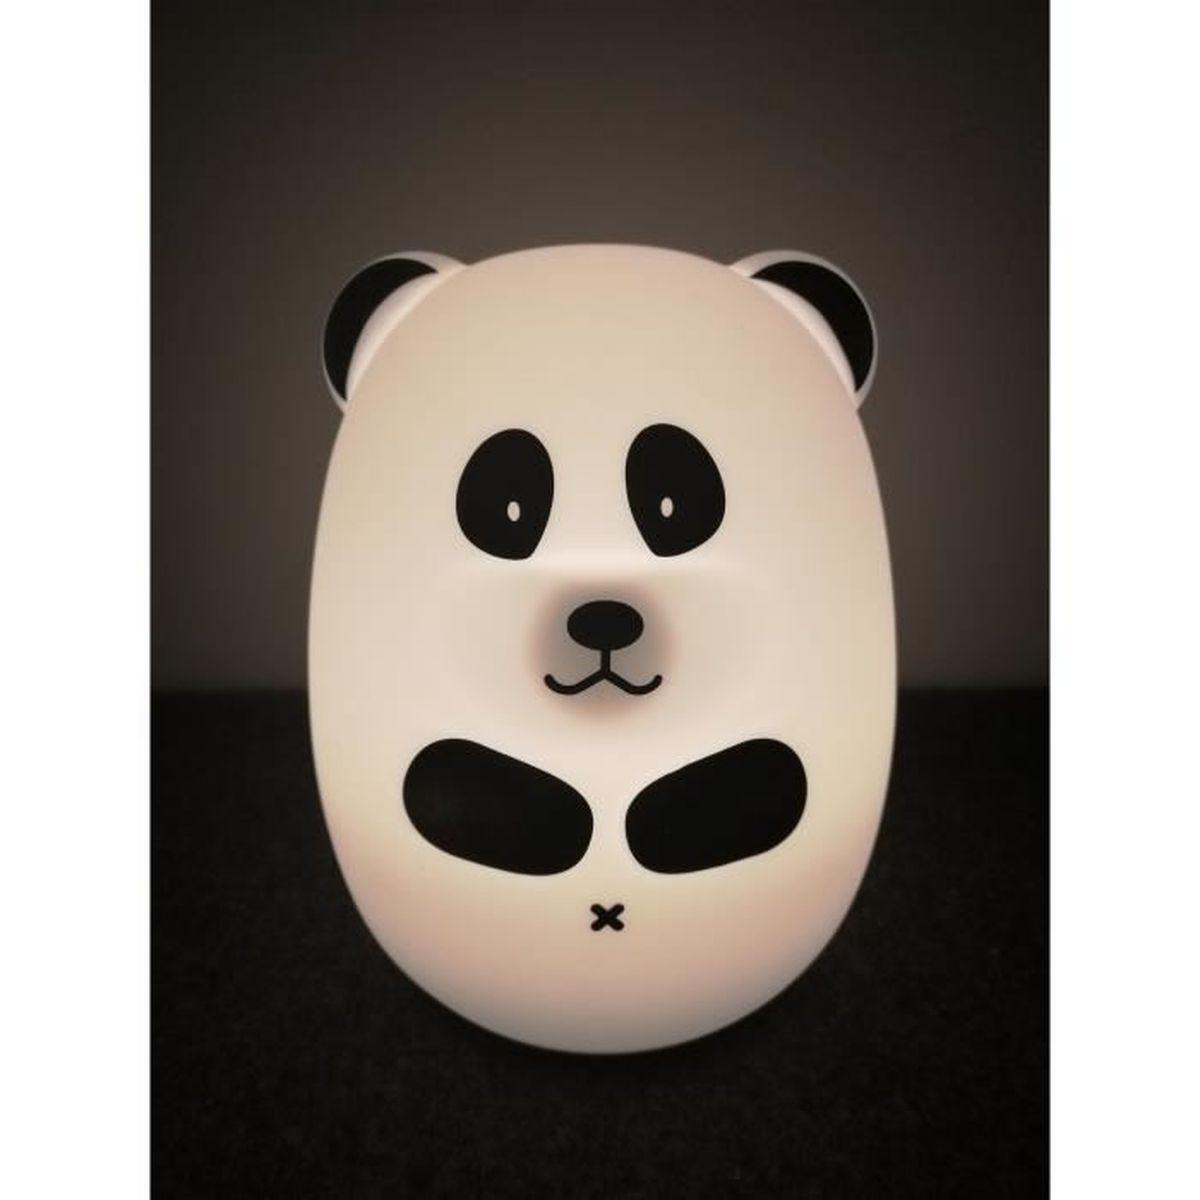 ENCEINTE NOMADE Ledwood - Enceinte - Veilleuse Lumineuse Bluetooth